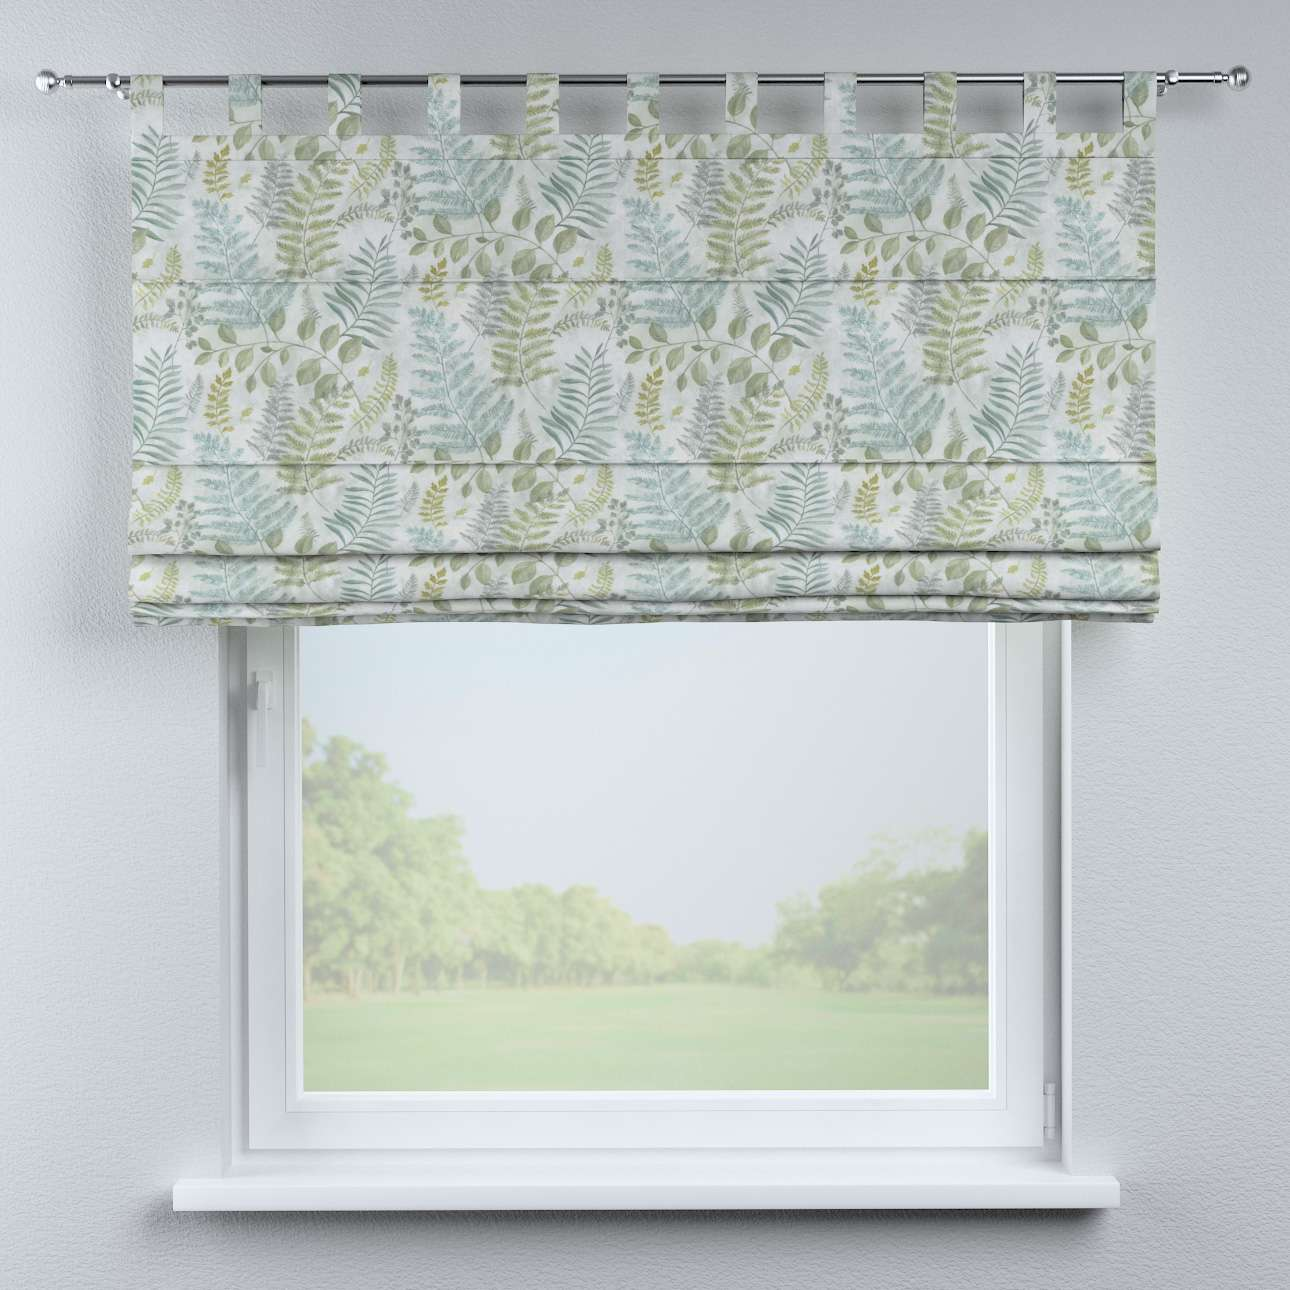 Foldegardin Verona<br/>Med stropper til gardinstang fra kollektionen Pastel Forest, Stof: 142-46